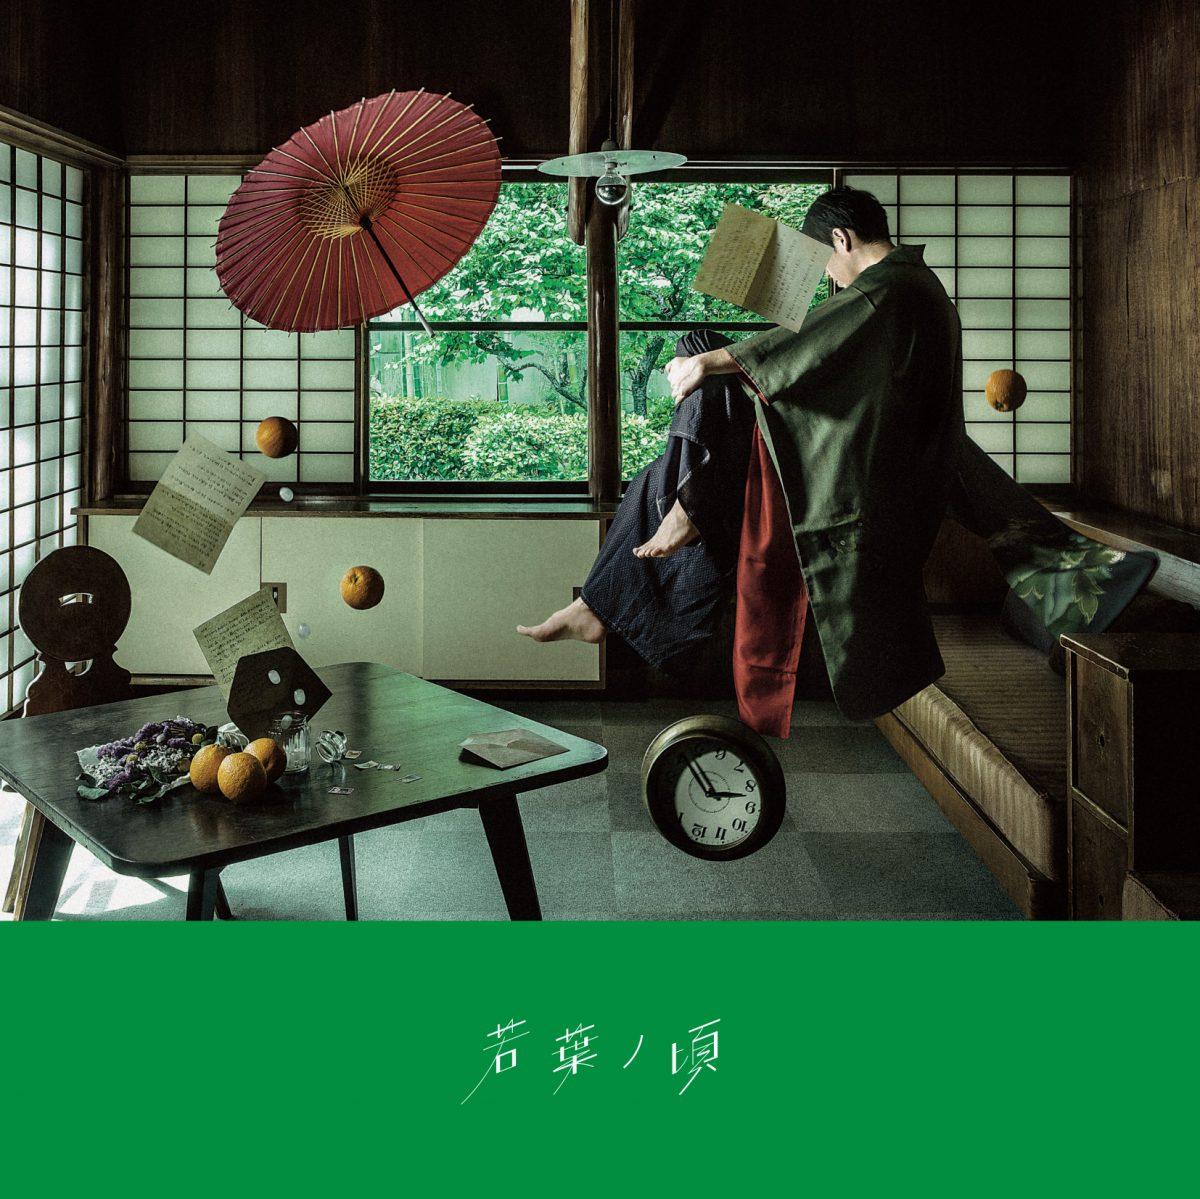 NEW ALBUM「若葉ノ頃」全曲トレーラー解禁